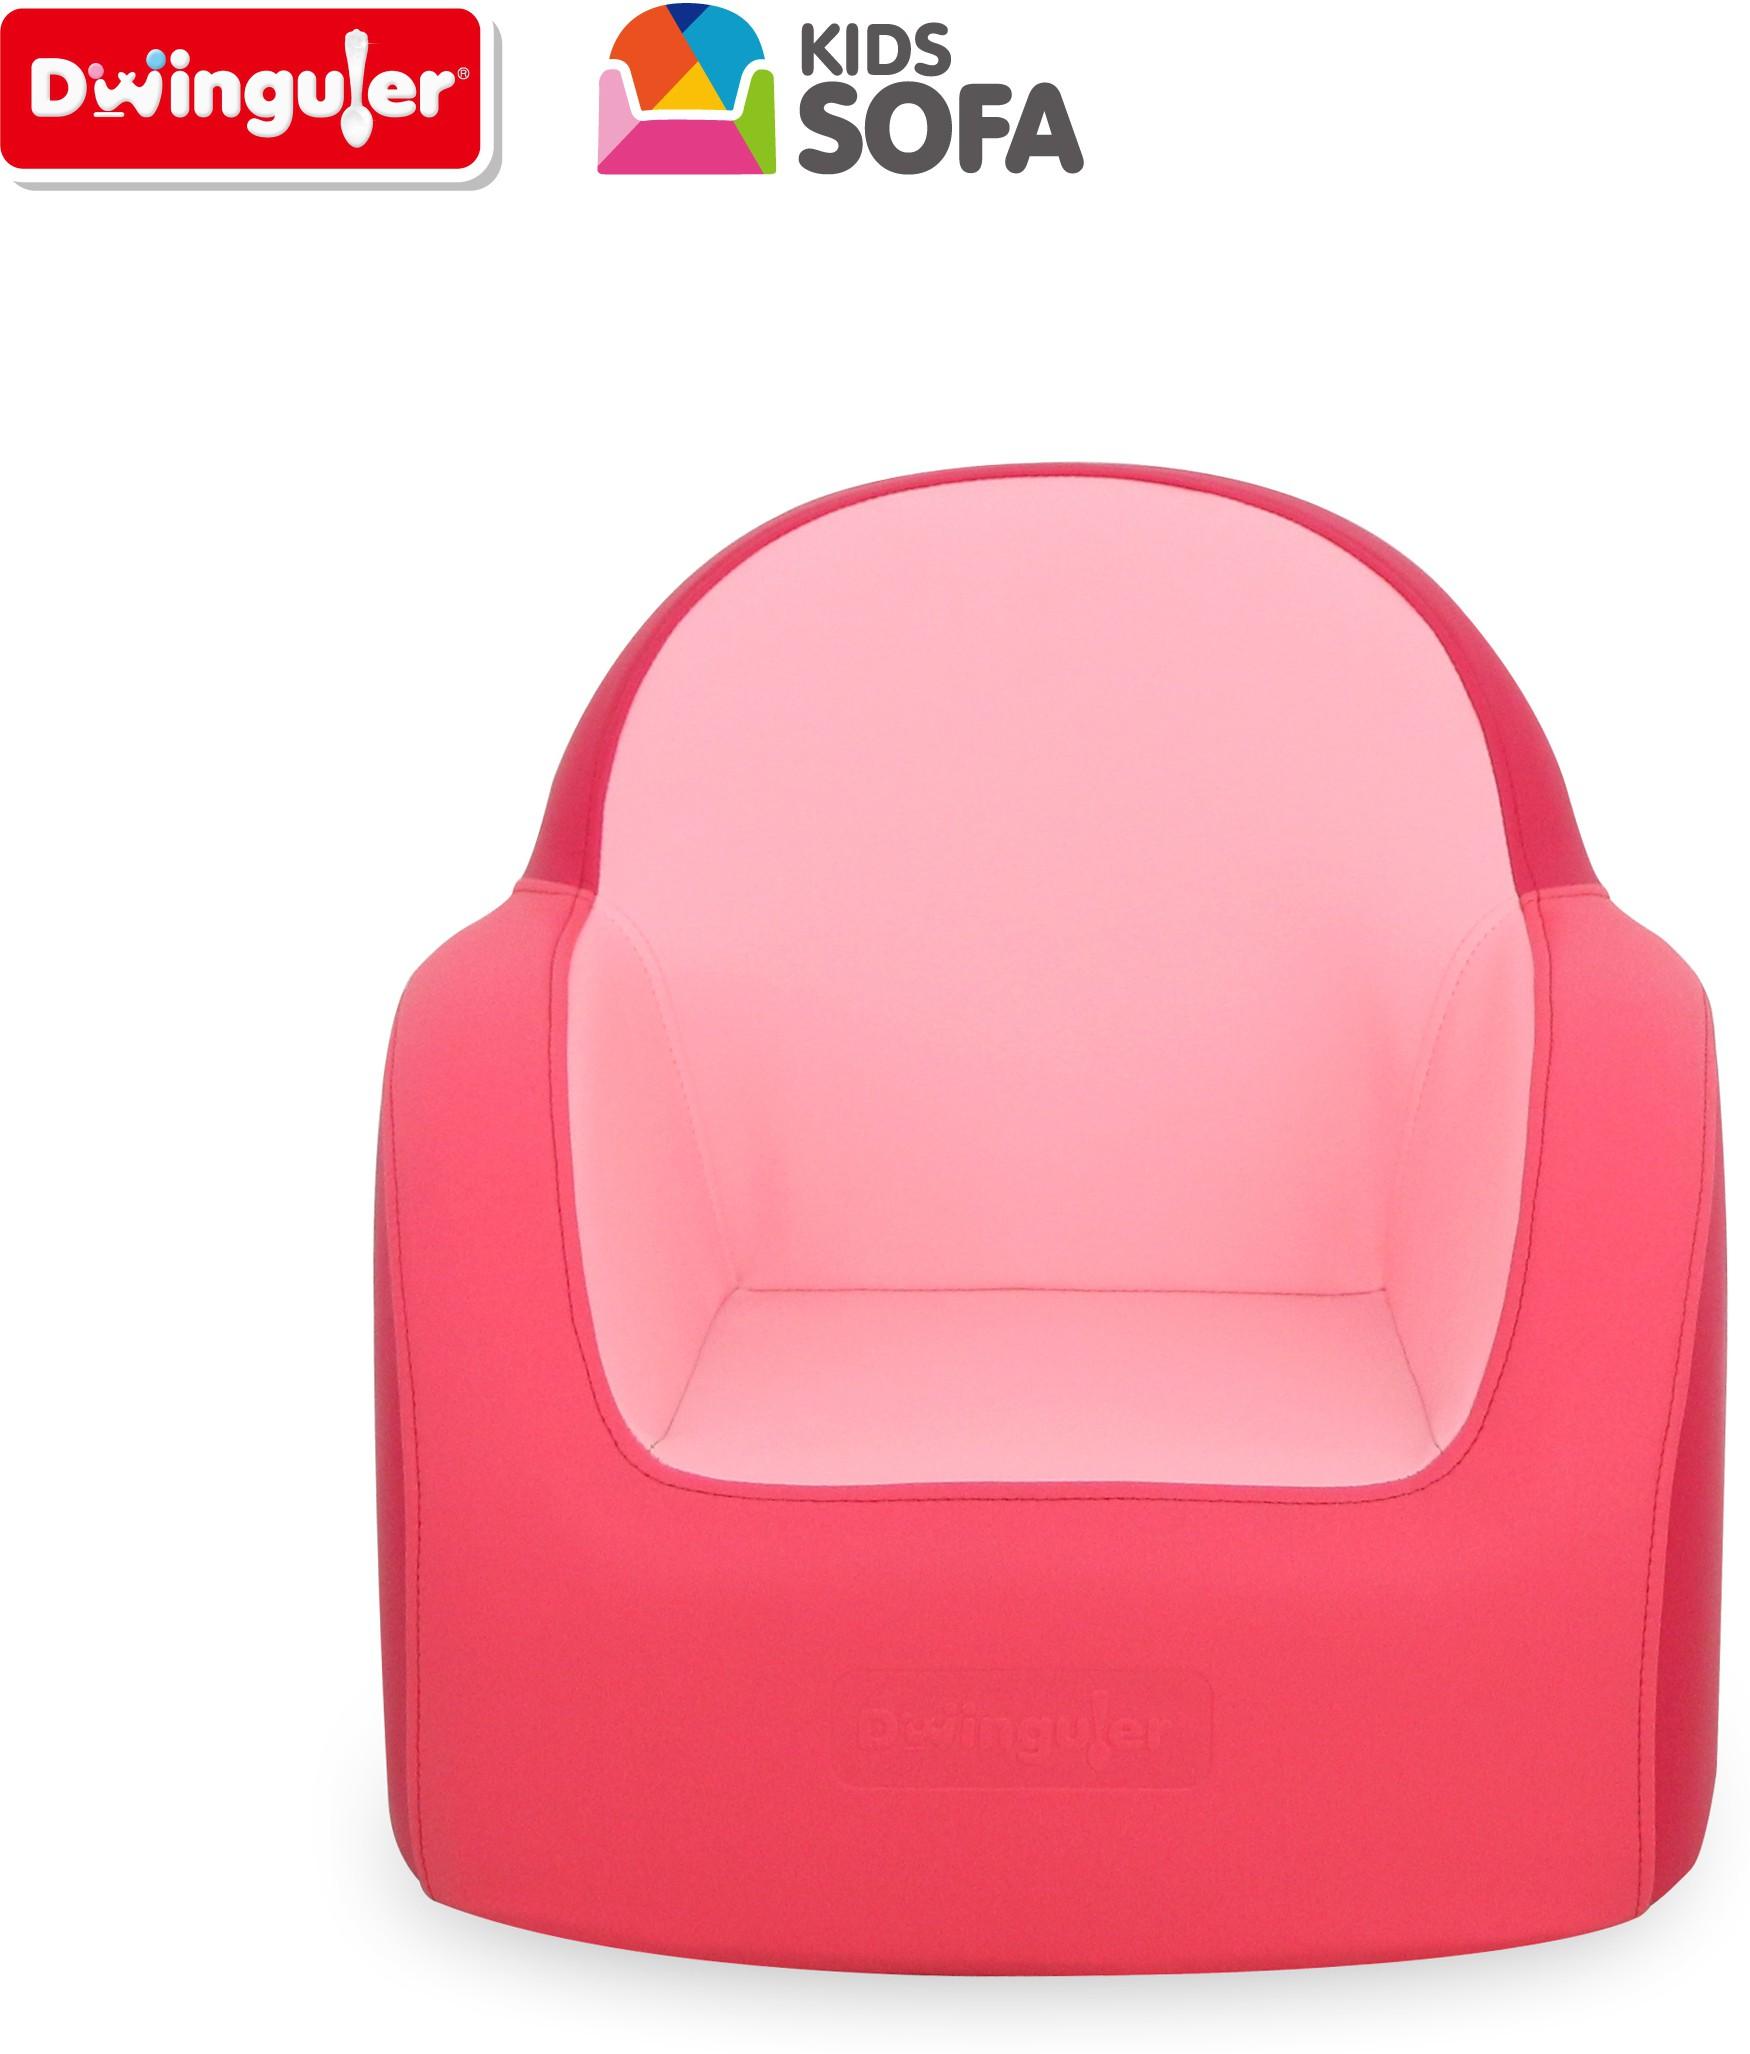 View Dwinguler Stanard Pink Kids Sofa Leatherette Sofa(Finish Color - Cherry Pink) Furniture (Dwinguler)